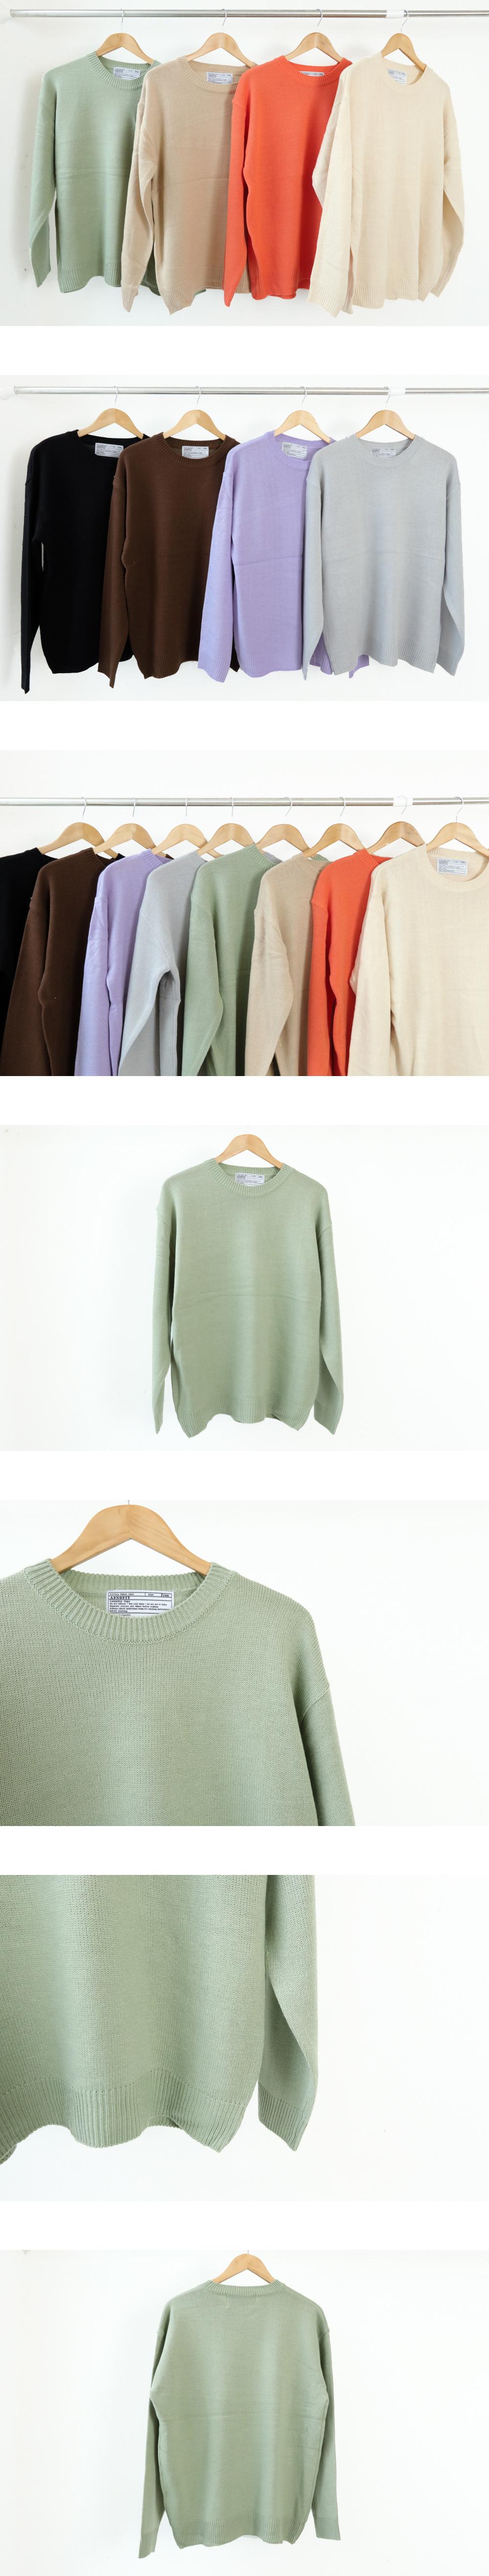 Basic round boxy knit